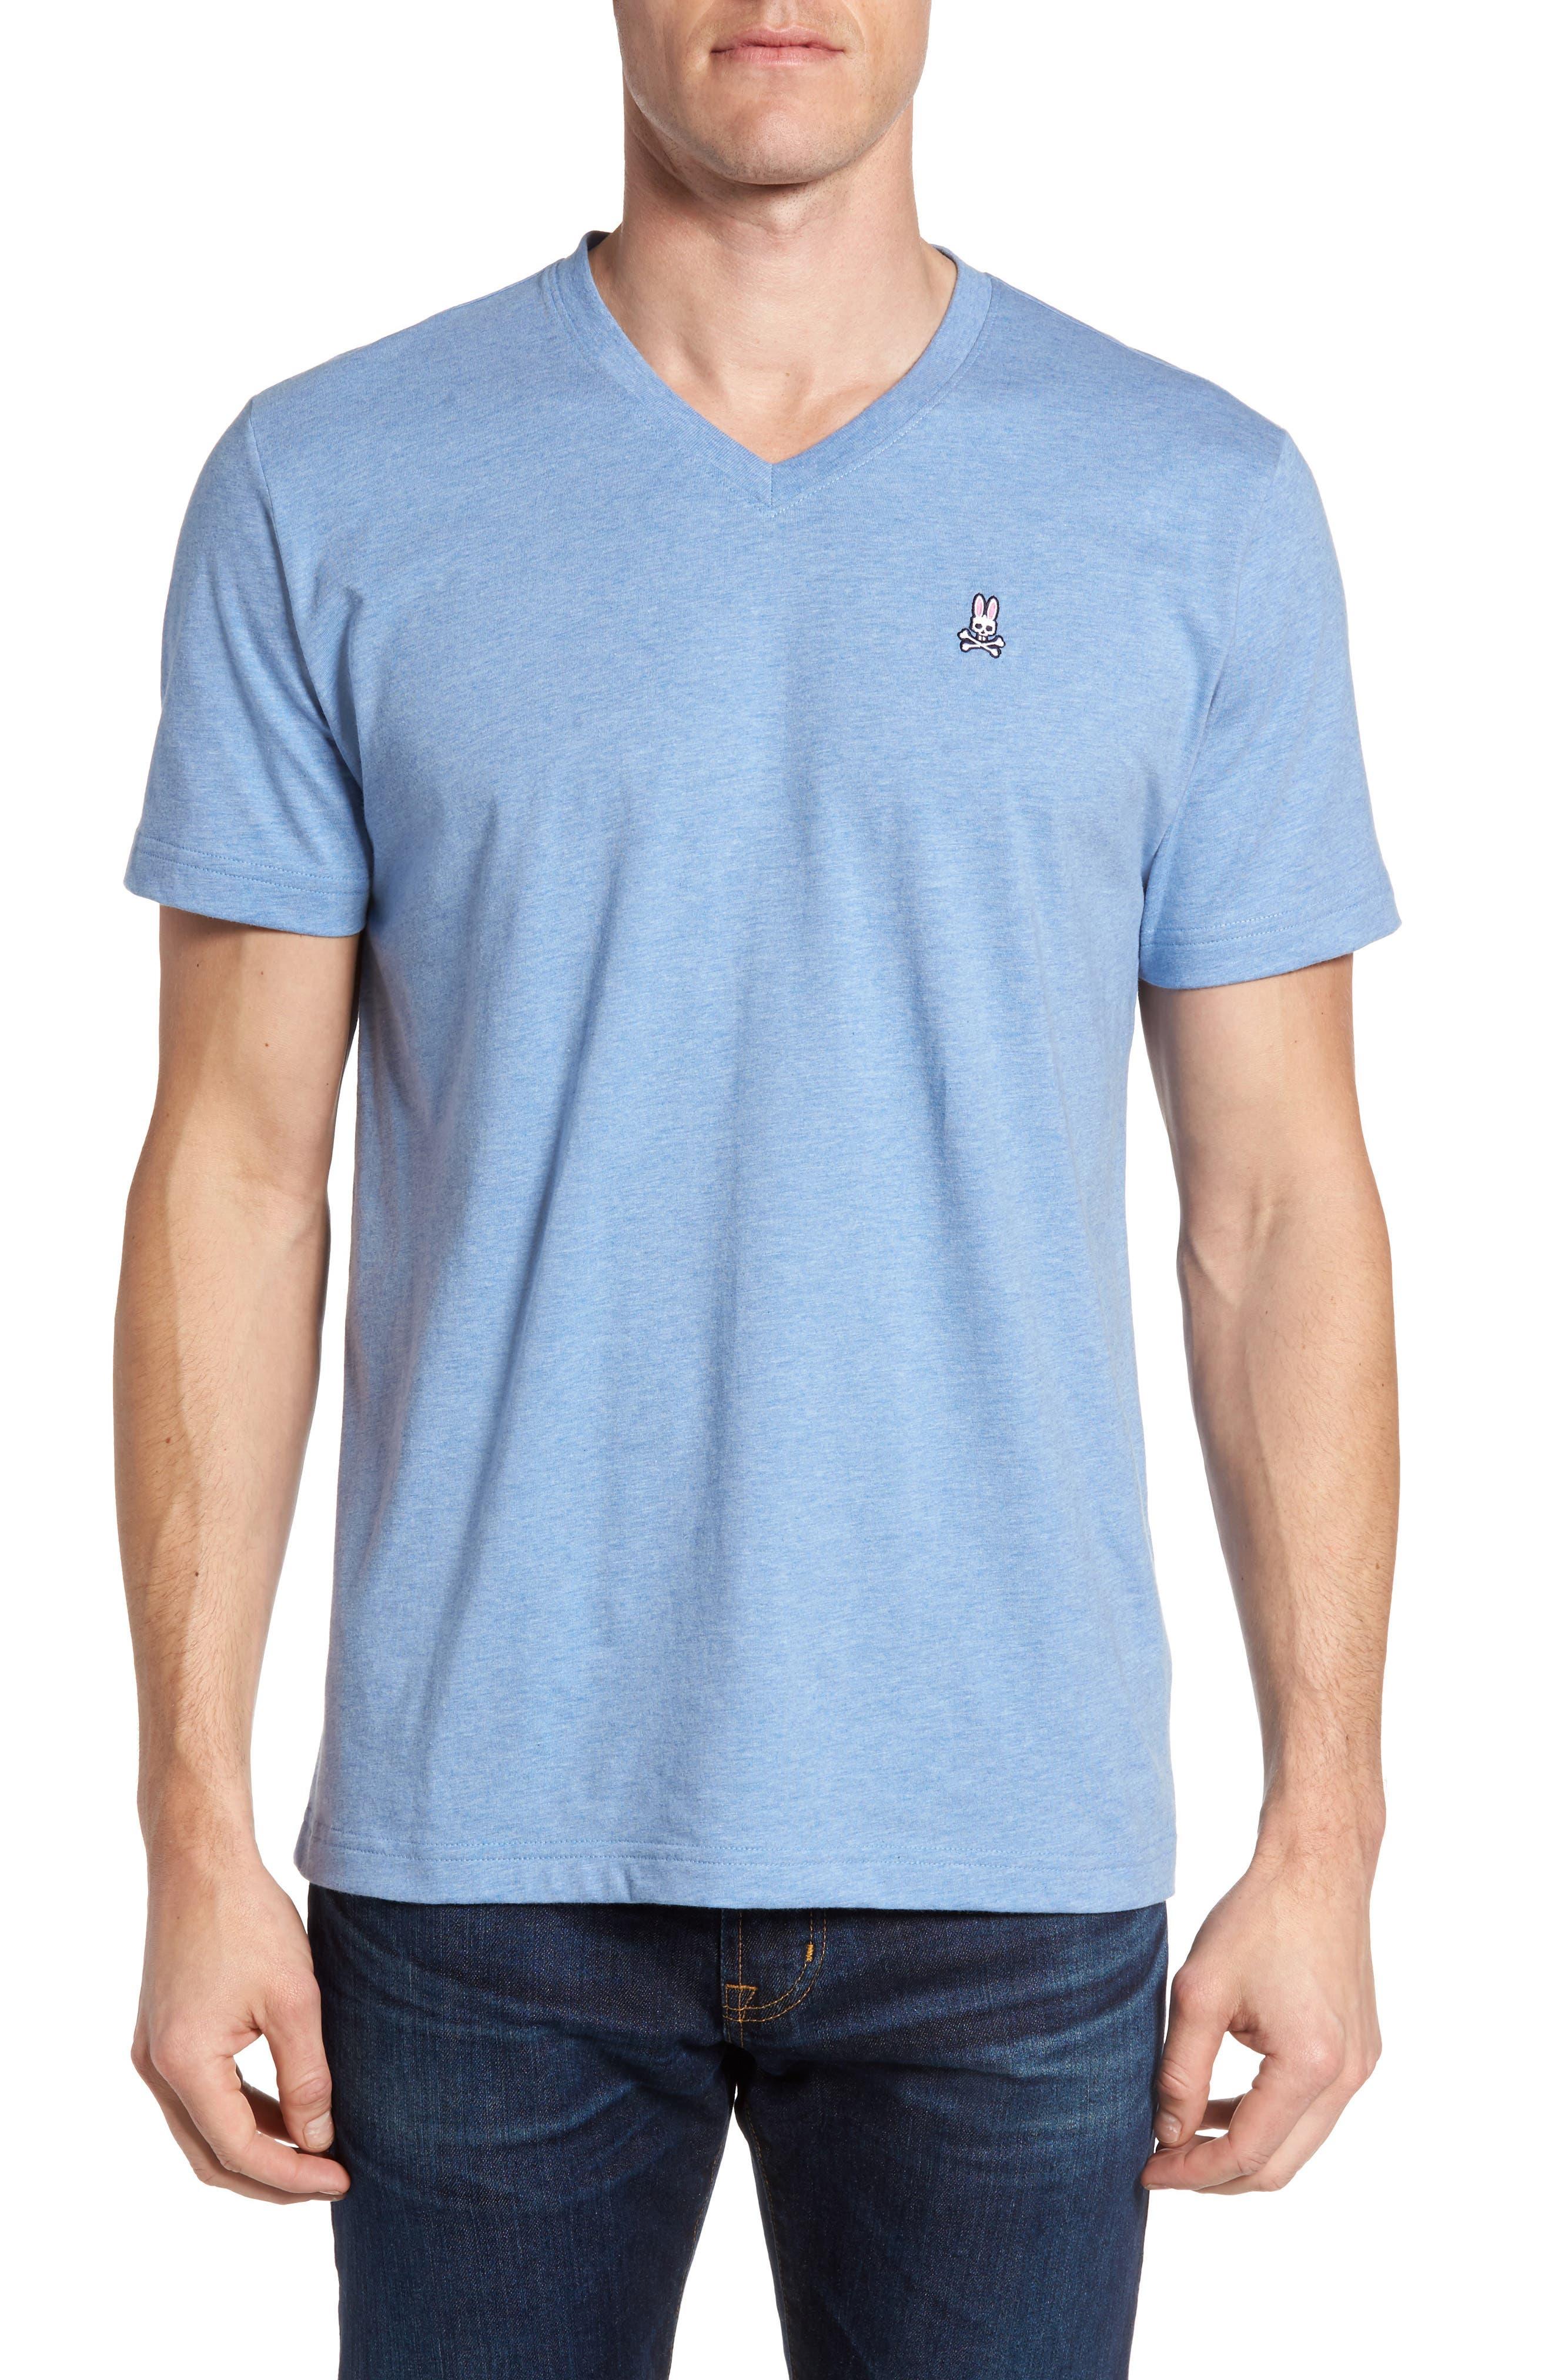 Alternate Image 1 Selected - Psycho Bunny Classic V-Neck T-Shirt